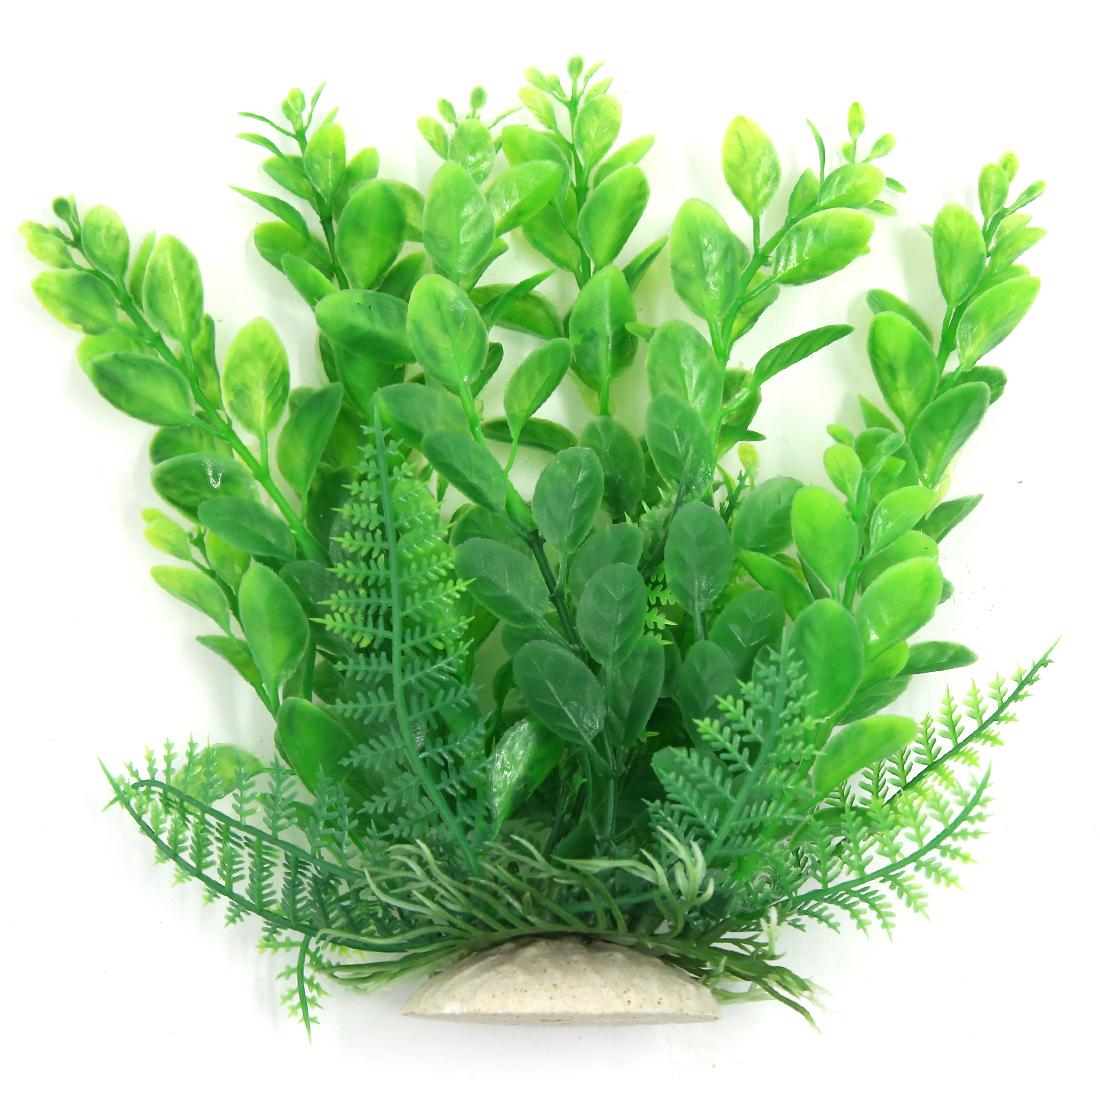 Aqua Landscape Fish Tank Decoration Plastic Plant Green 17cm High for Betta